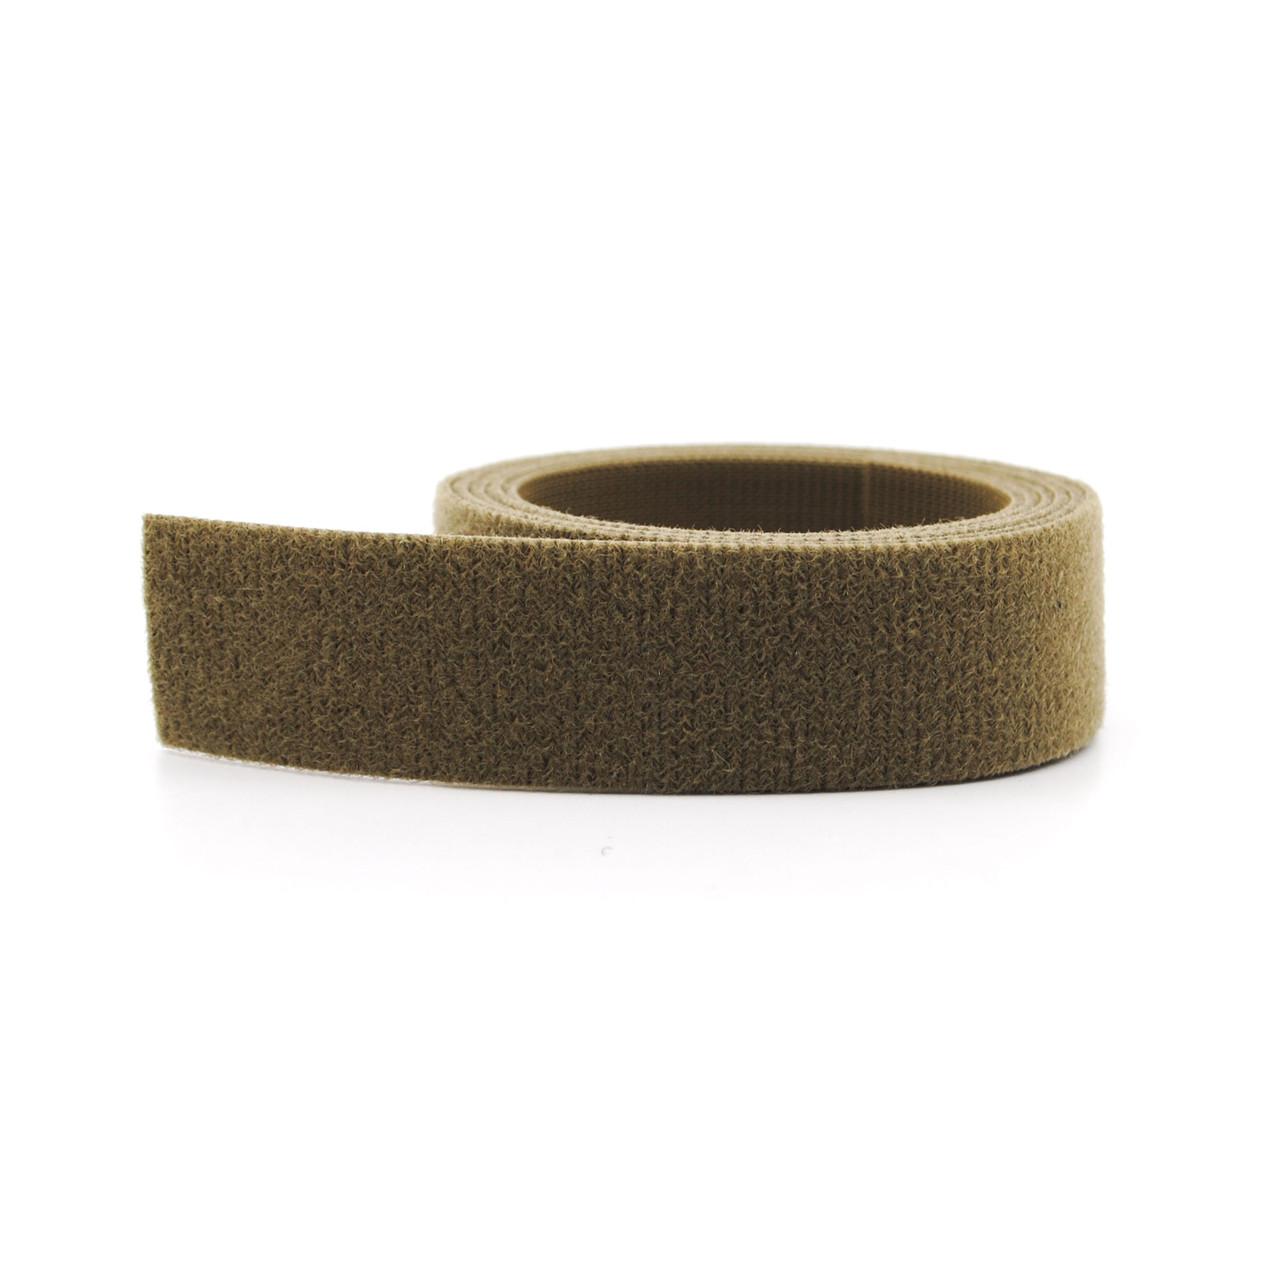 "VELCRO® ONE-WRAP® MIL SPEC Tape - 1"" Tan / Velcro Straps - Bundling Straps - Velcro Tie - Velcro Strap"